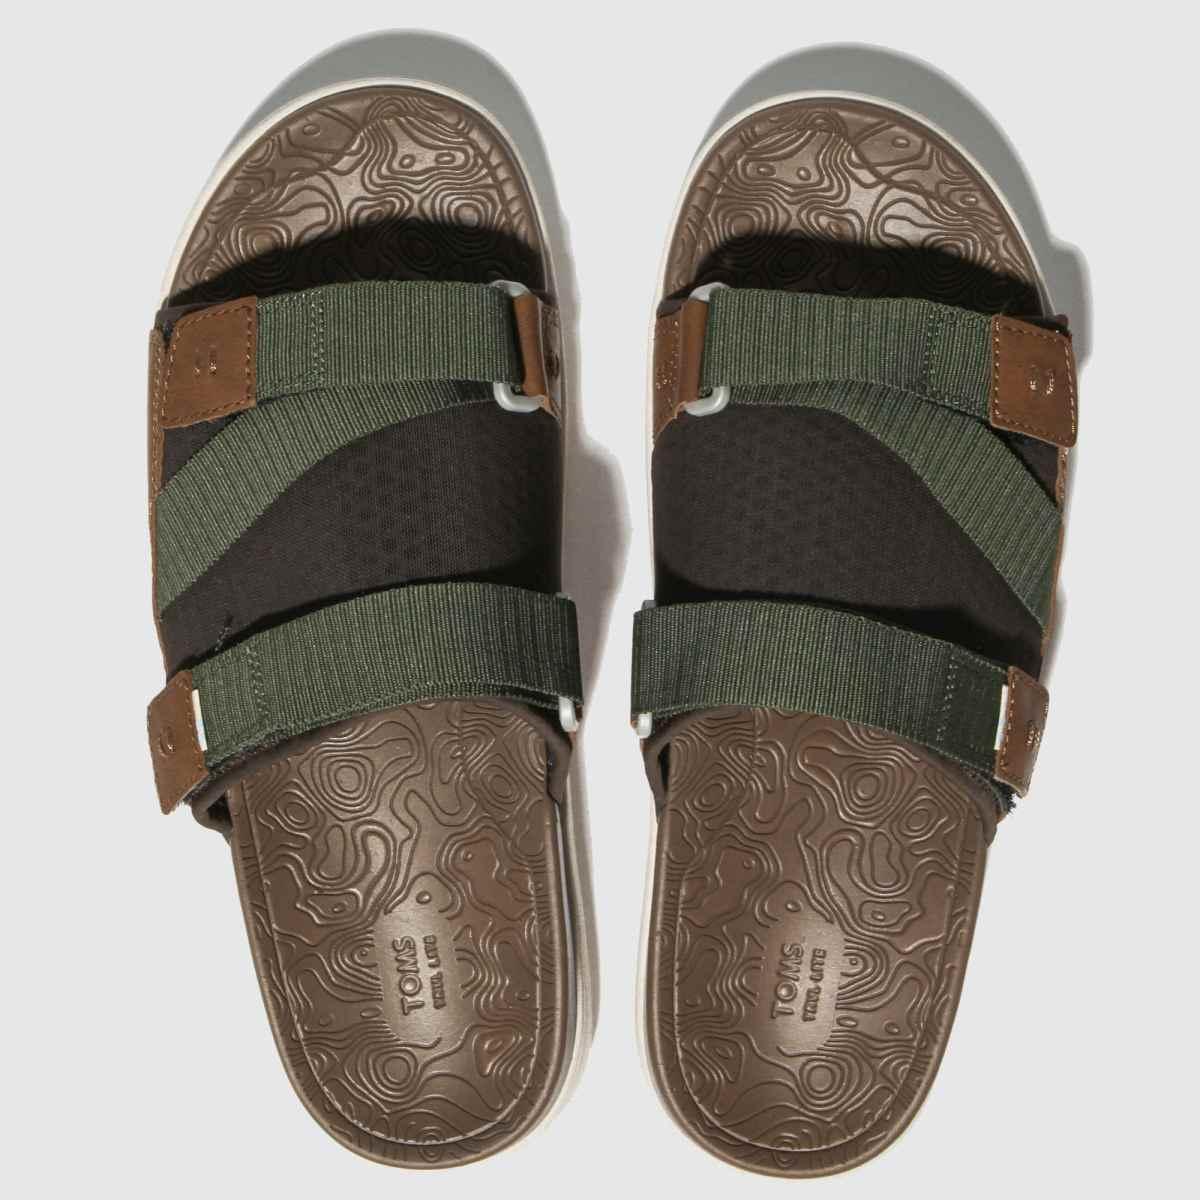 Toms Khaki Trvl Lite Sandals